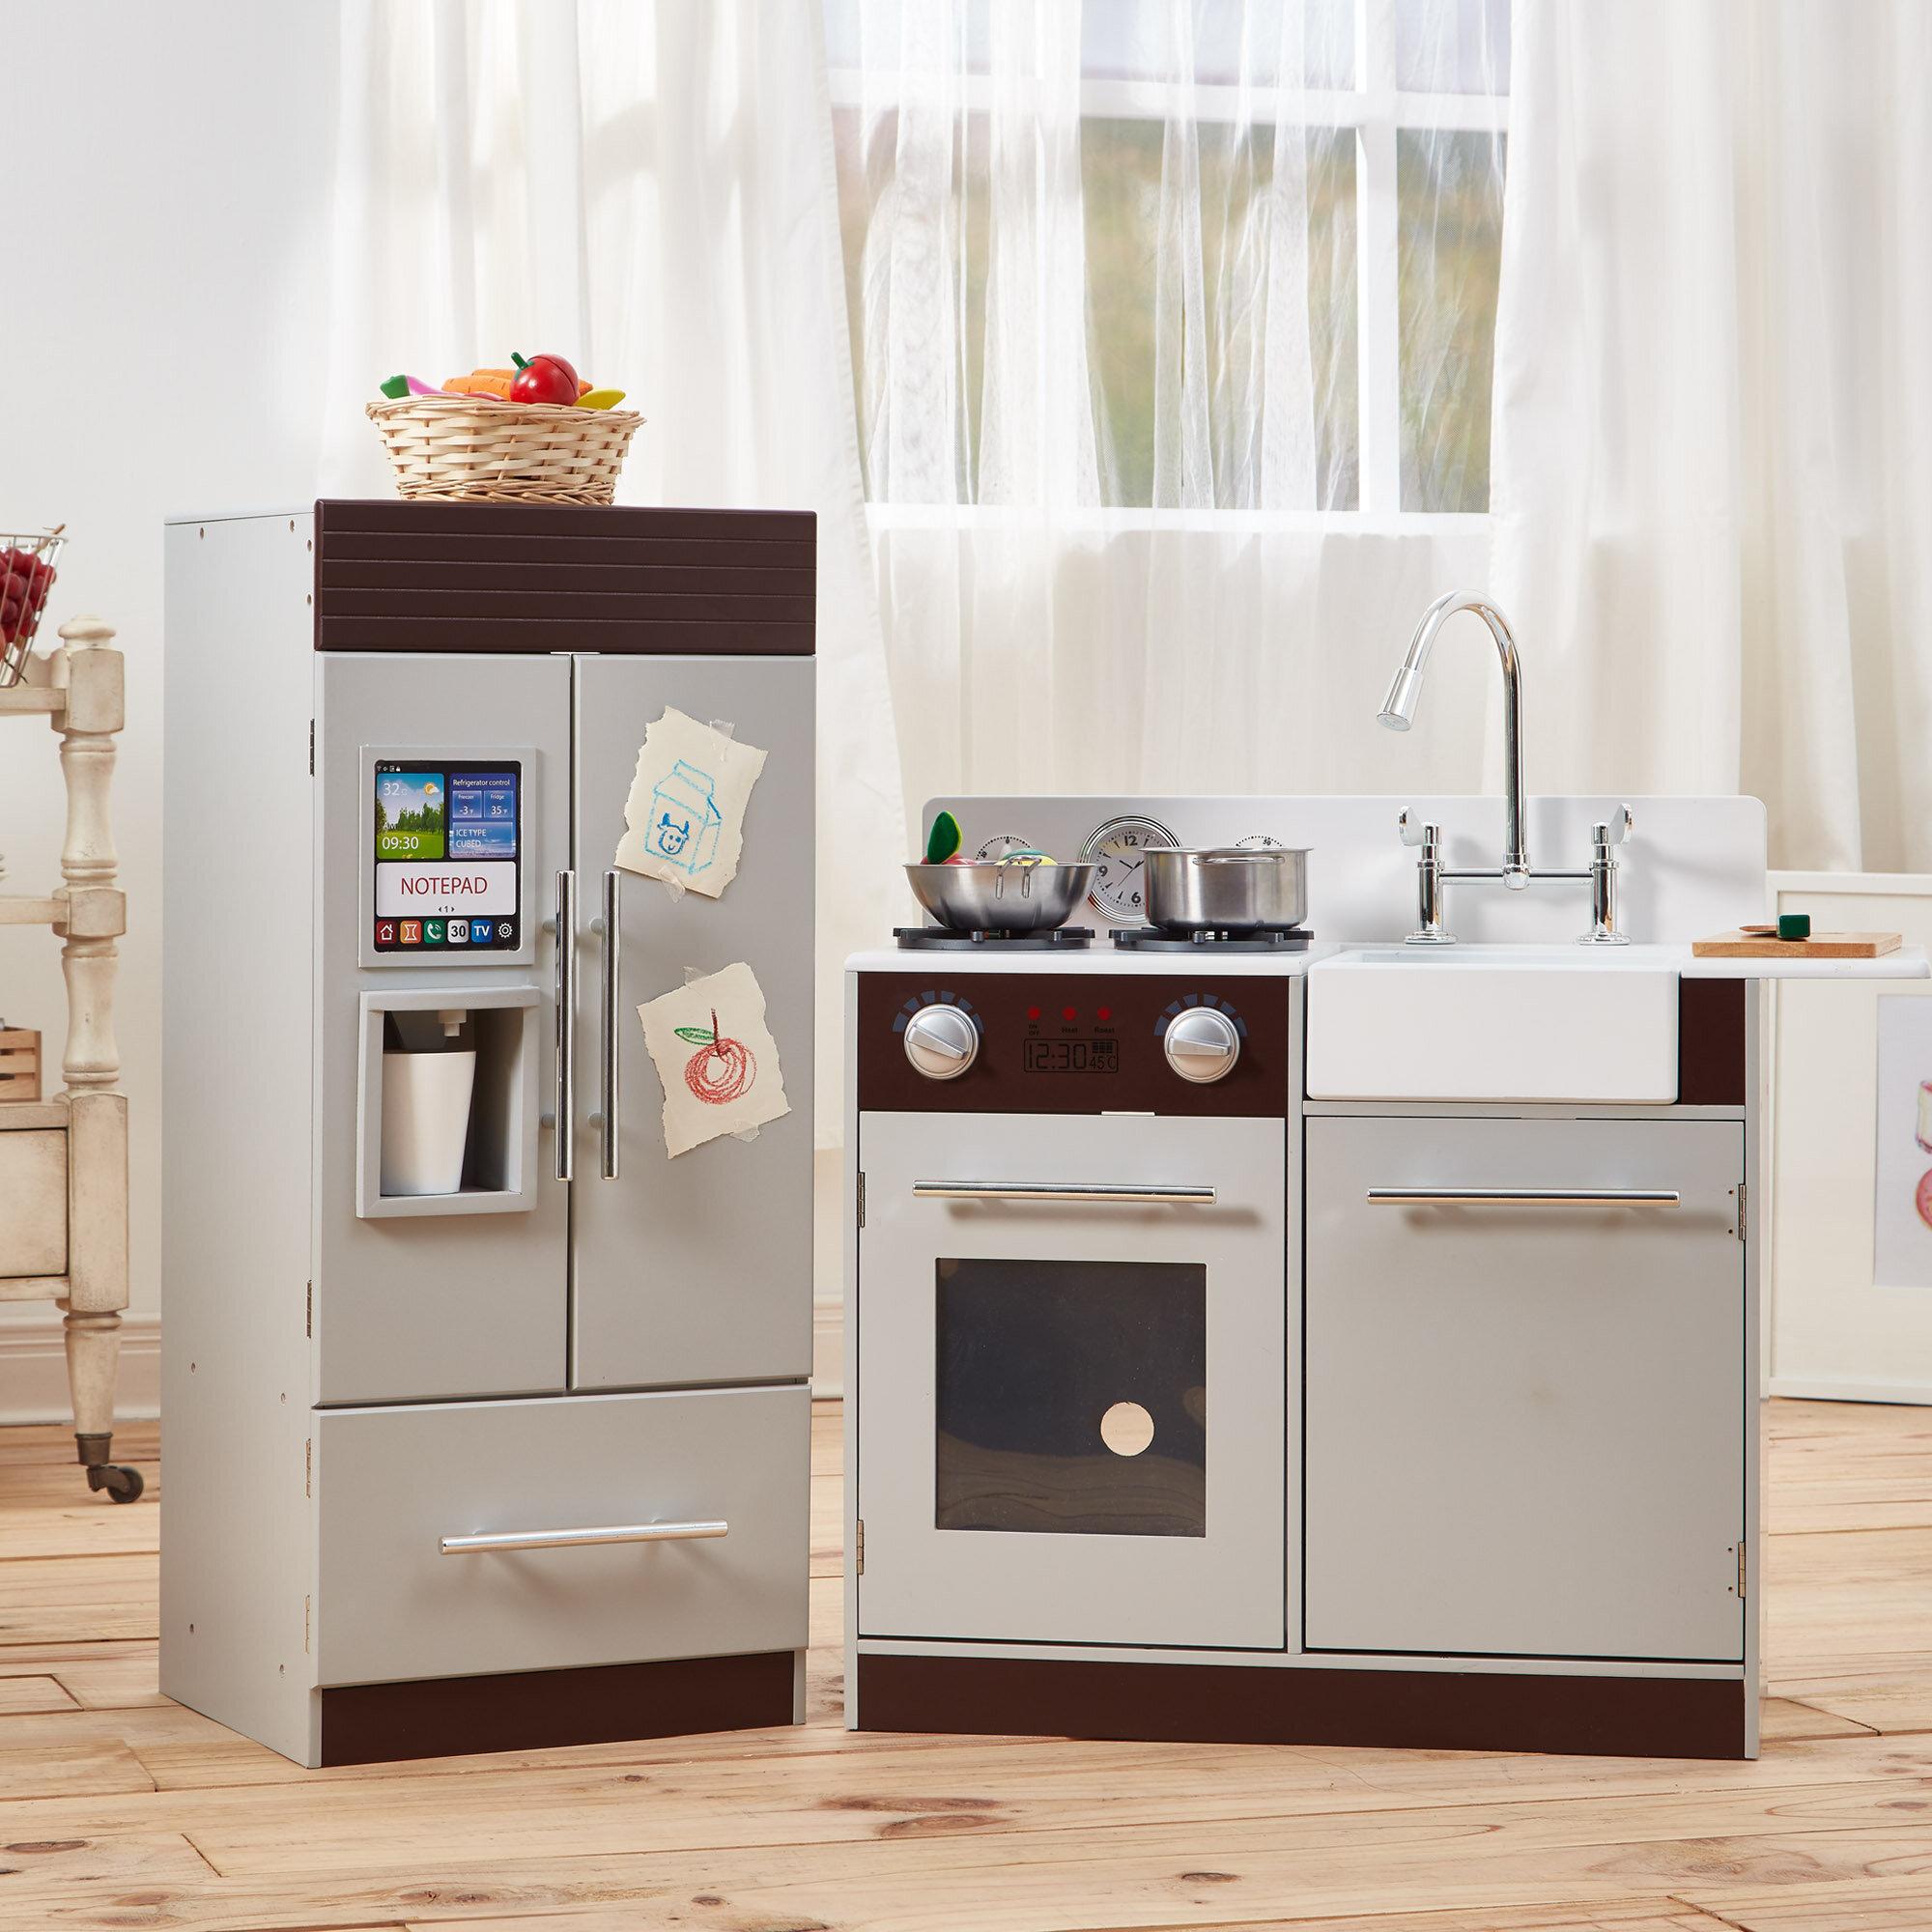 Teamson Kids 2 Piece Urban Adventure Play Kitchen Set Reviews